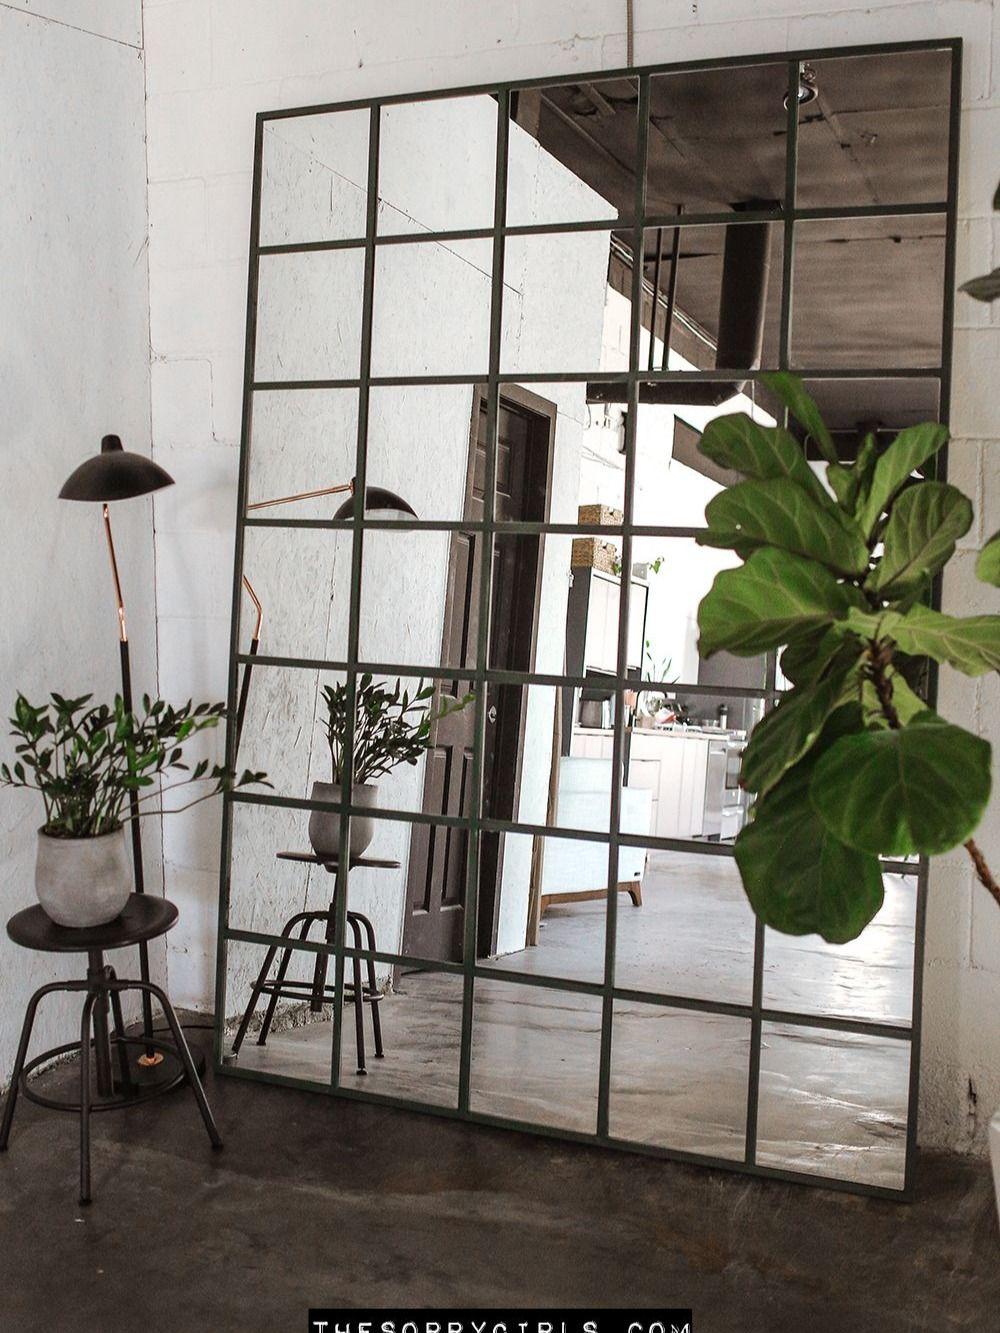 Diy Mirror Diy Crafts For Home Decor Ikea Diy Diy Home Decor Easy